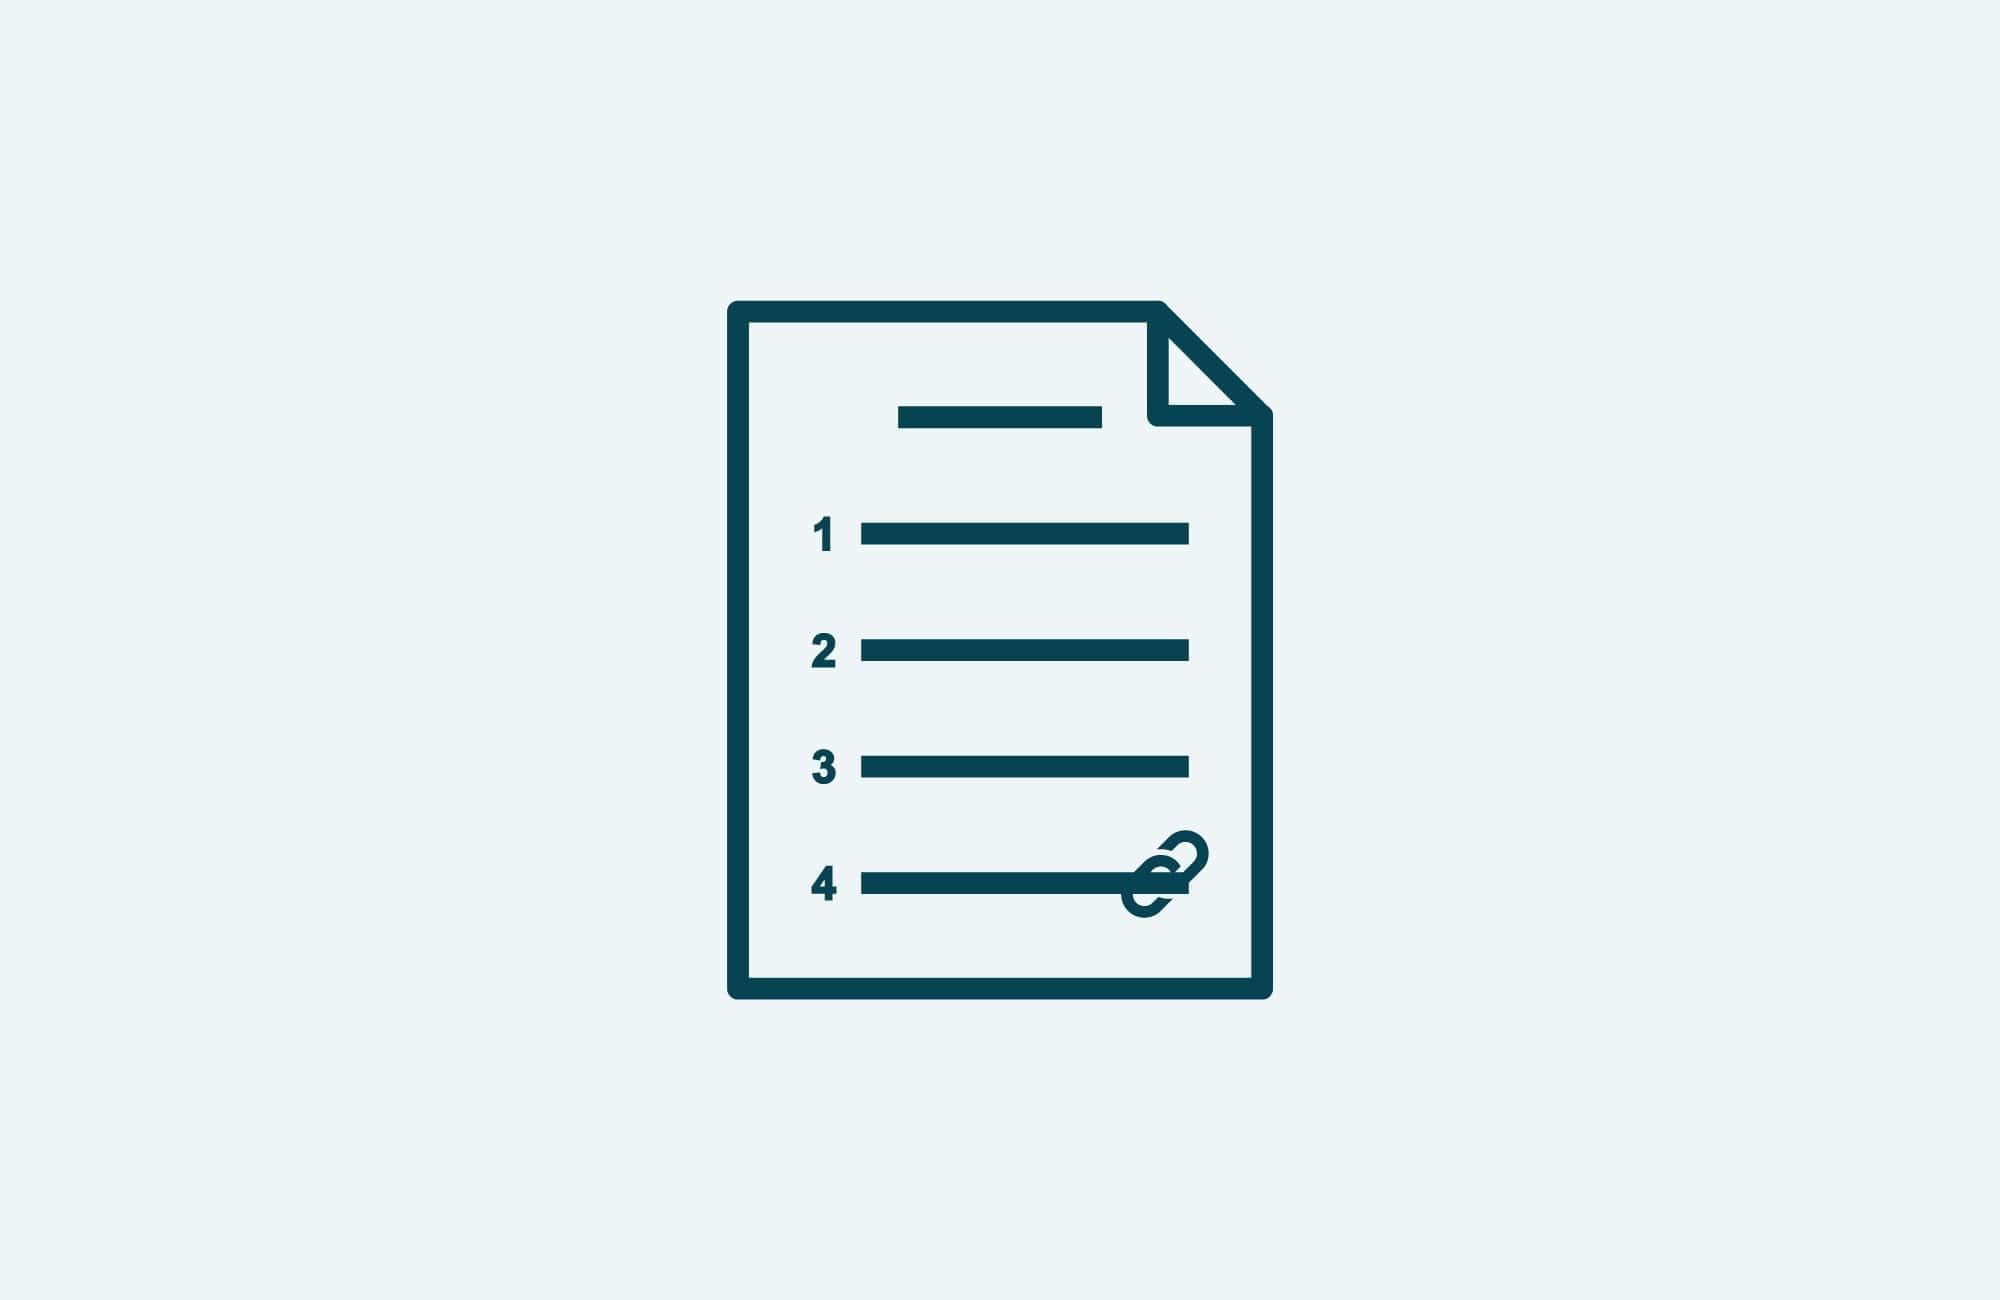 Linképítés listaoldalakon (resource page link building)